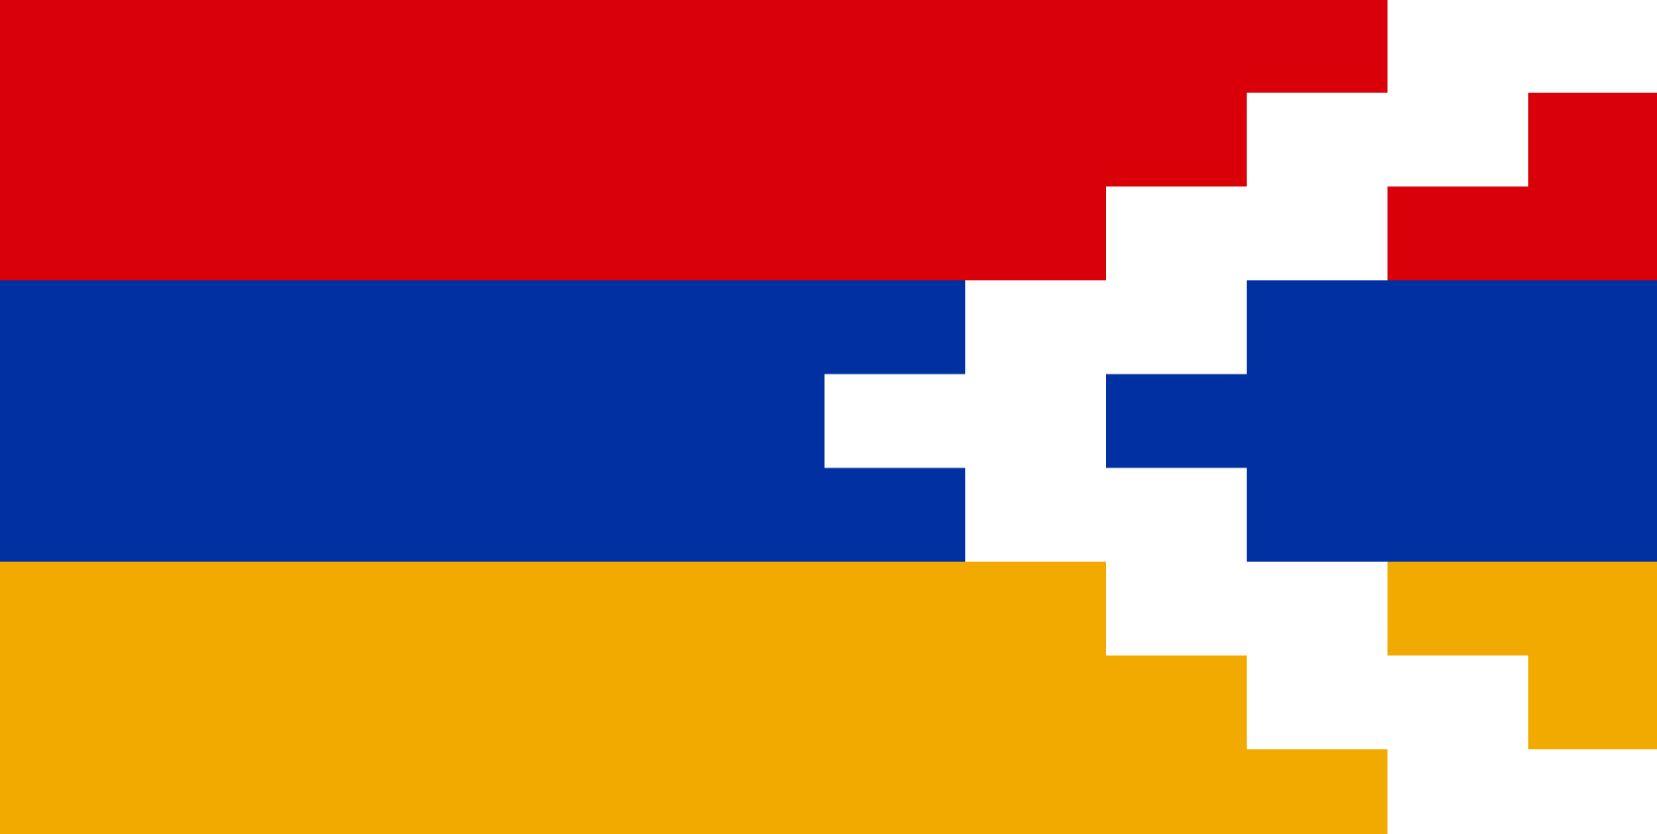 Россия — гарант спасения армян Арцаха от турецко-азербайджанского геноцида